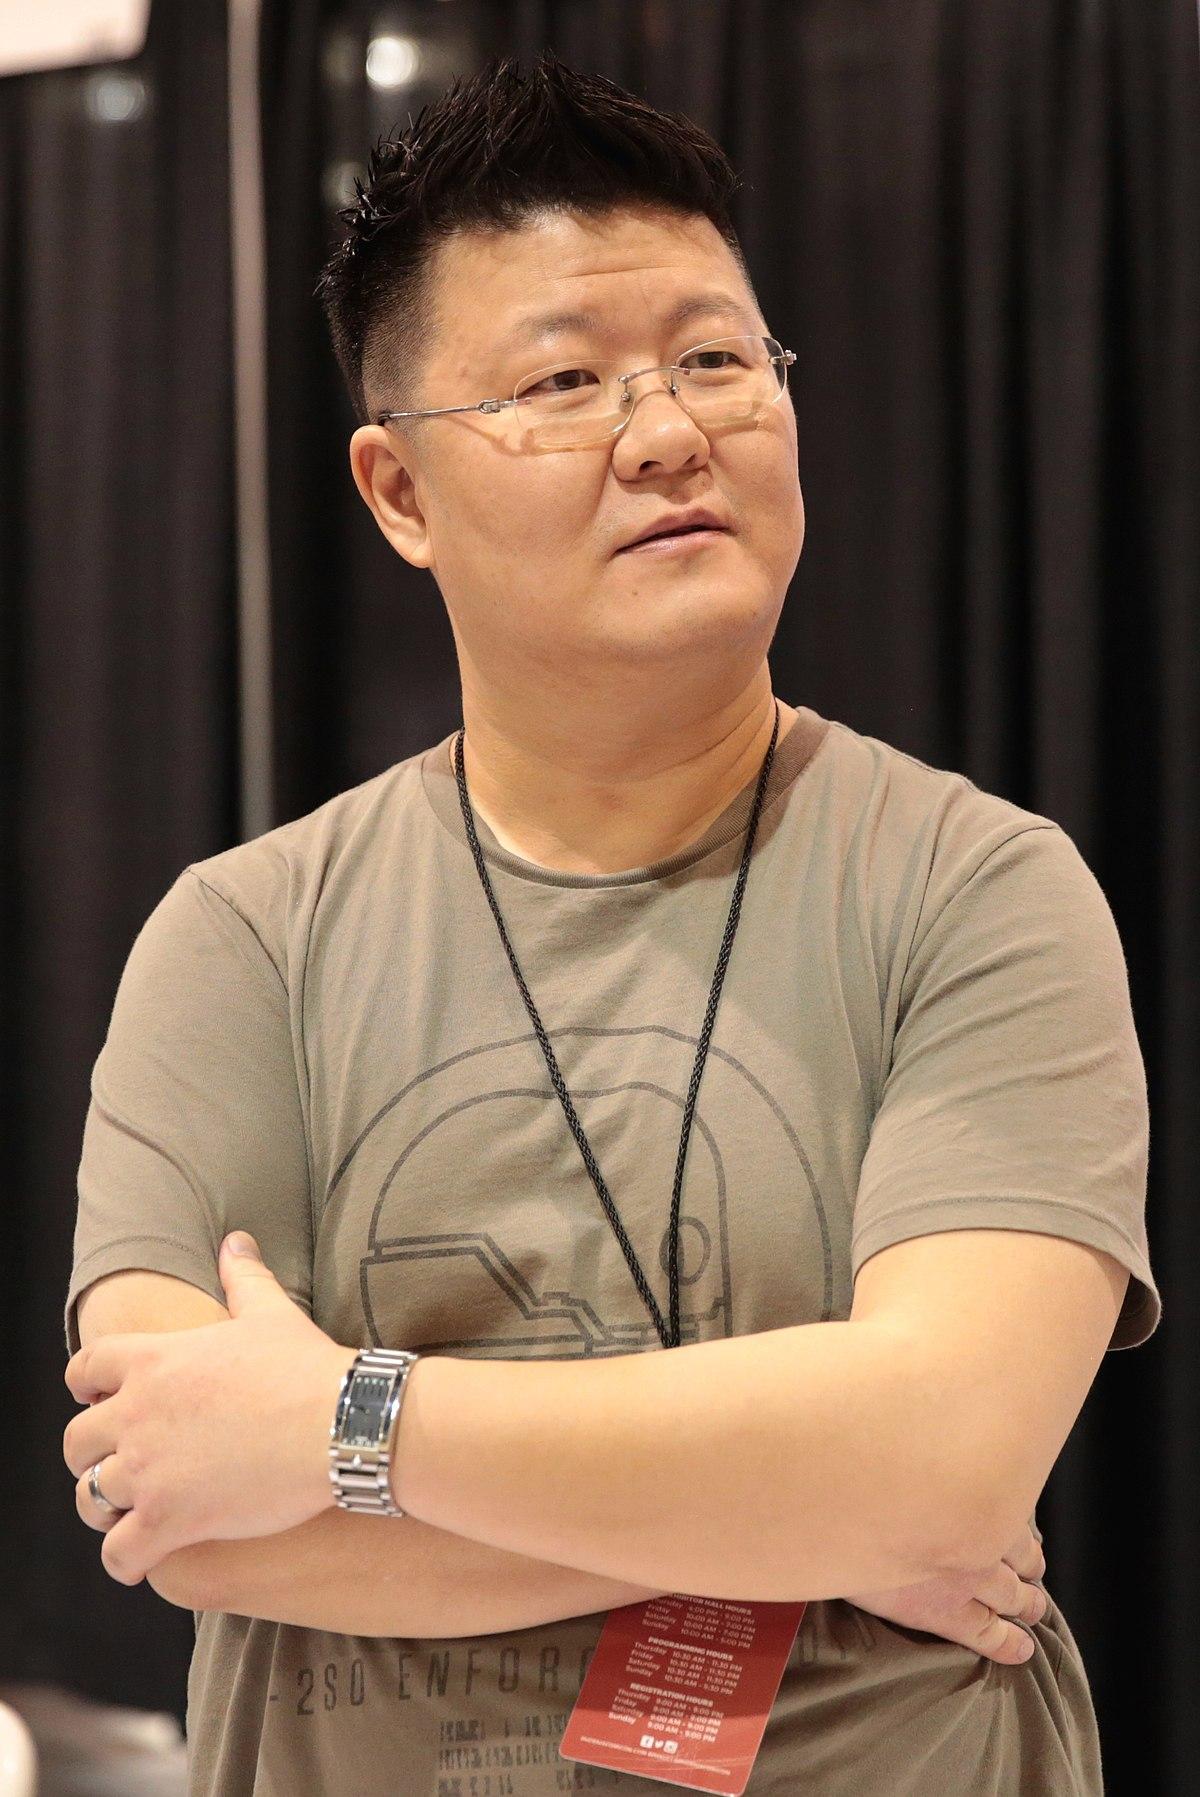 Jae Lee - Wikipedia  Jae Lee - Wikip...